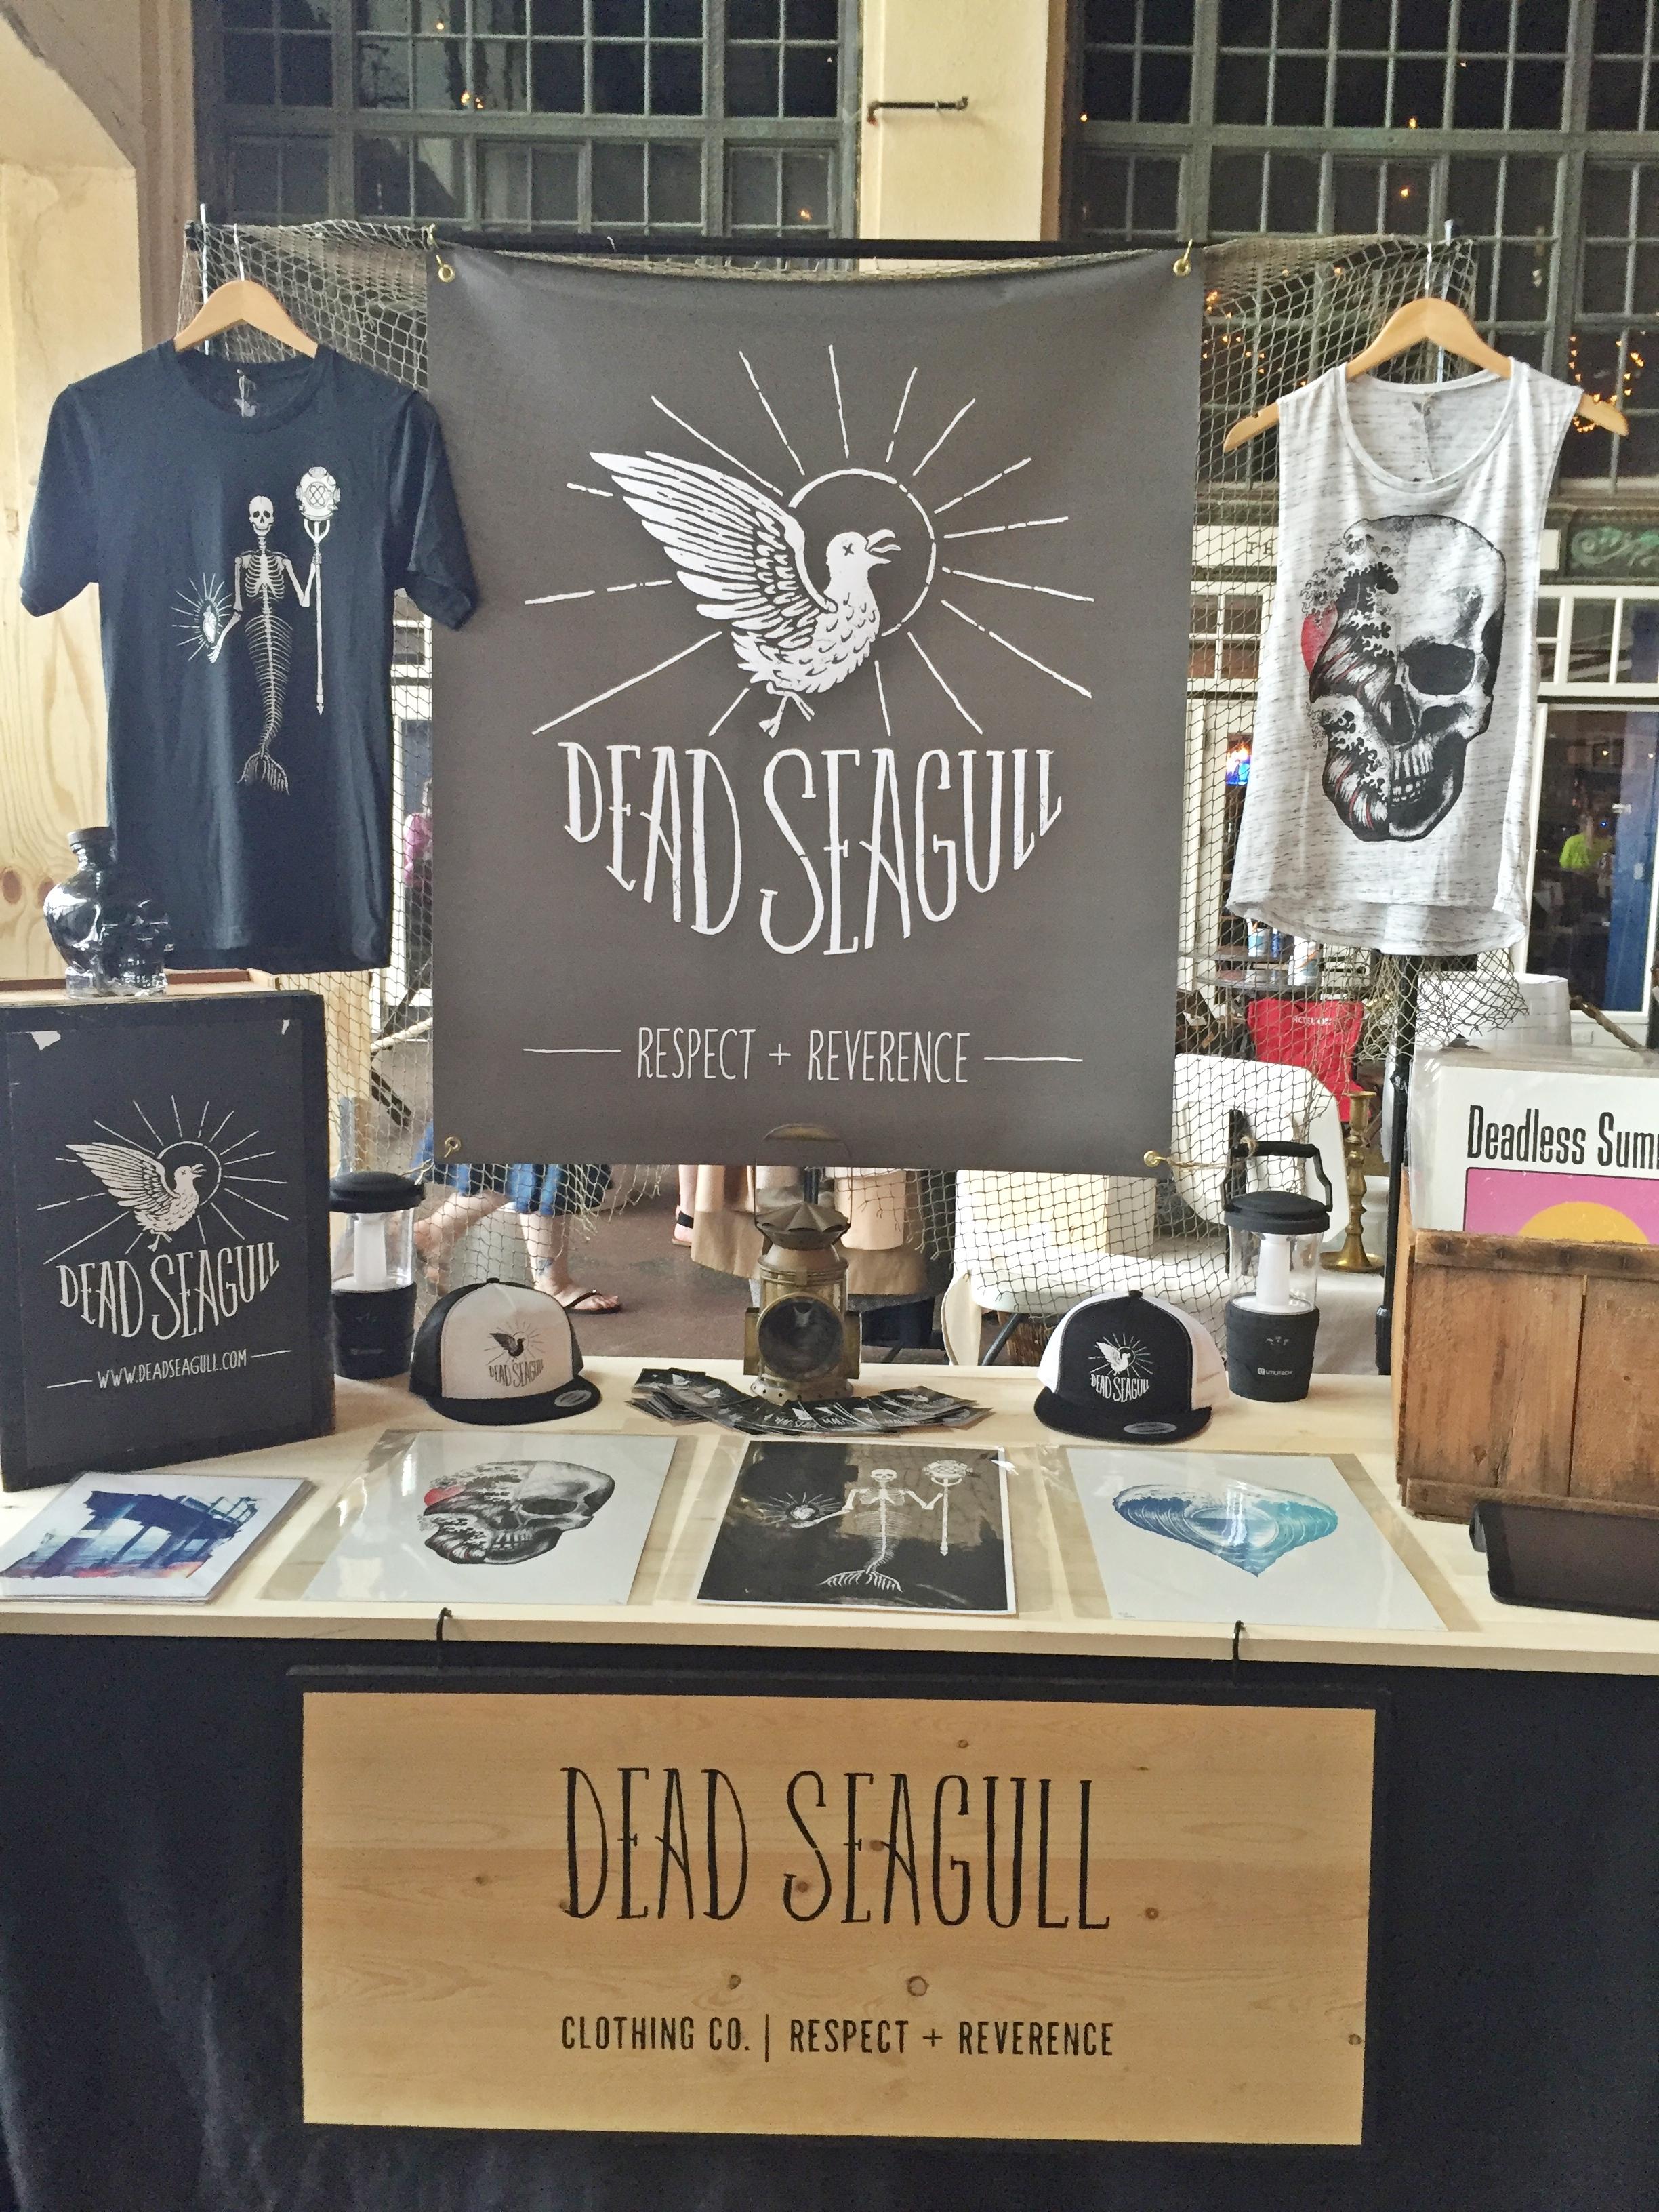 dead seagull clothing co. - artwork/apparel Saturday & Sunday